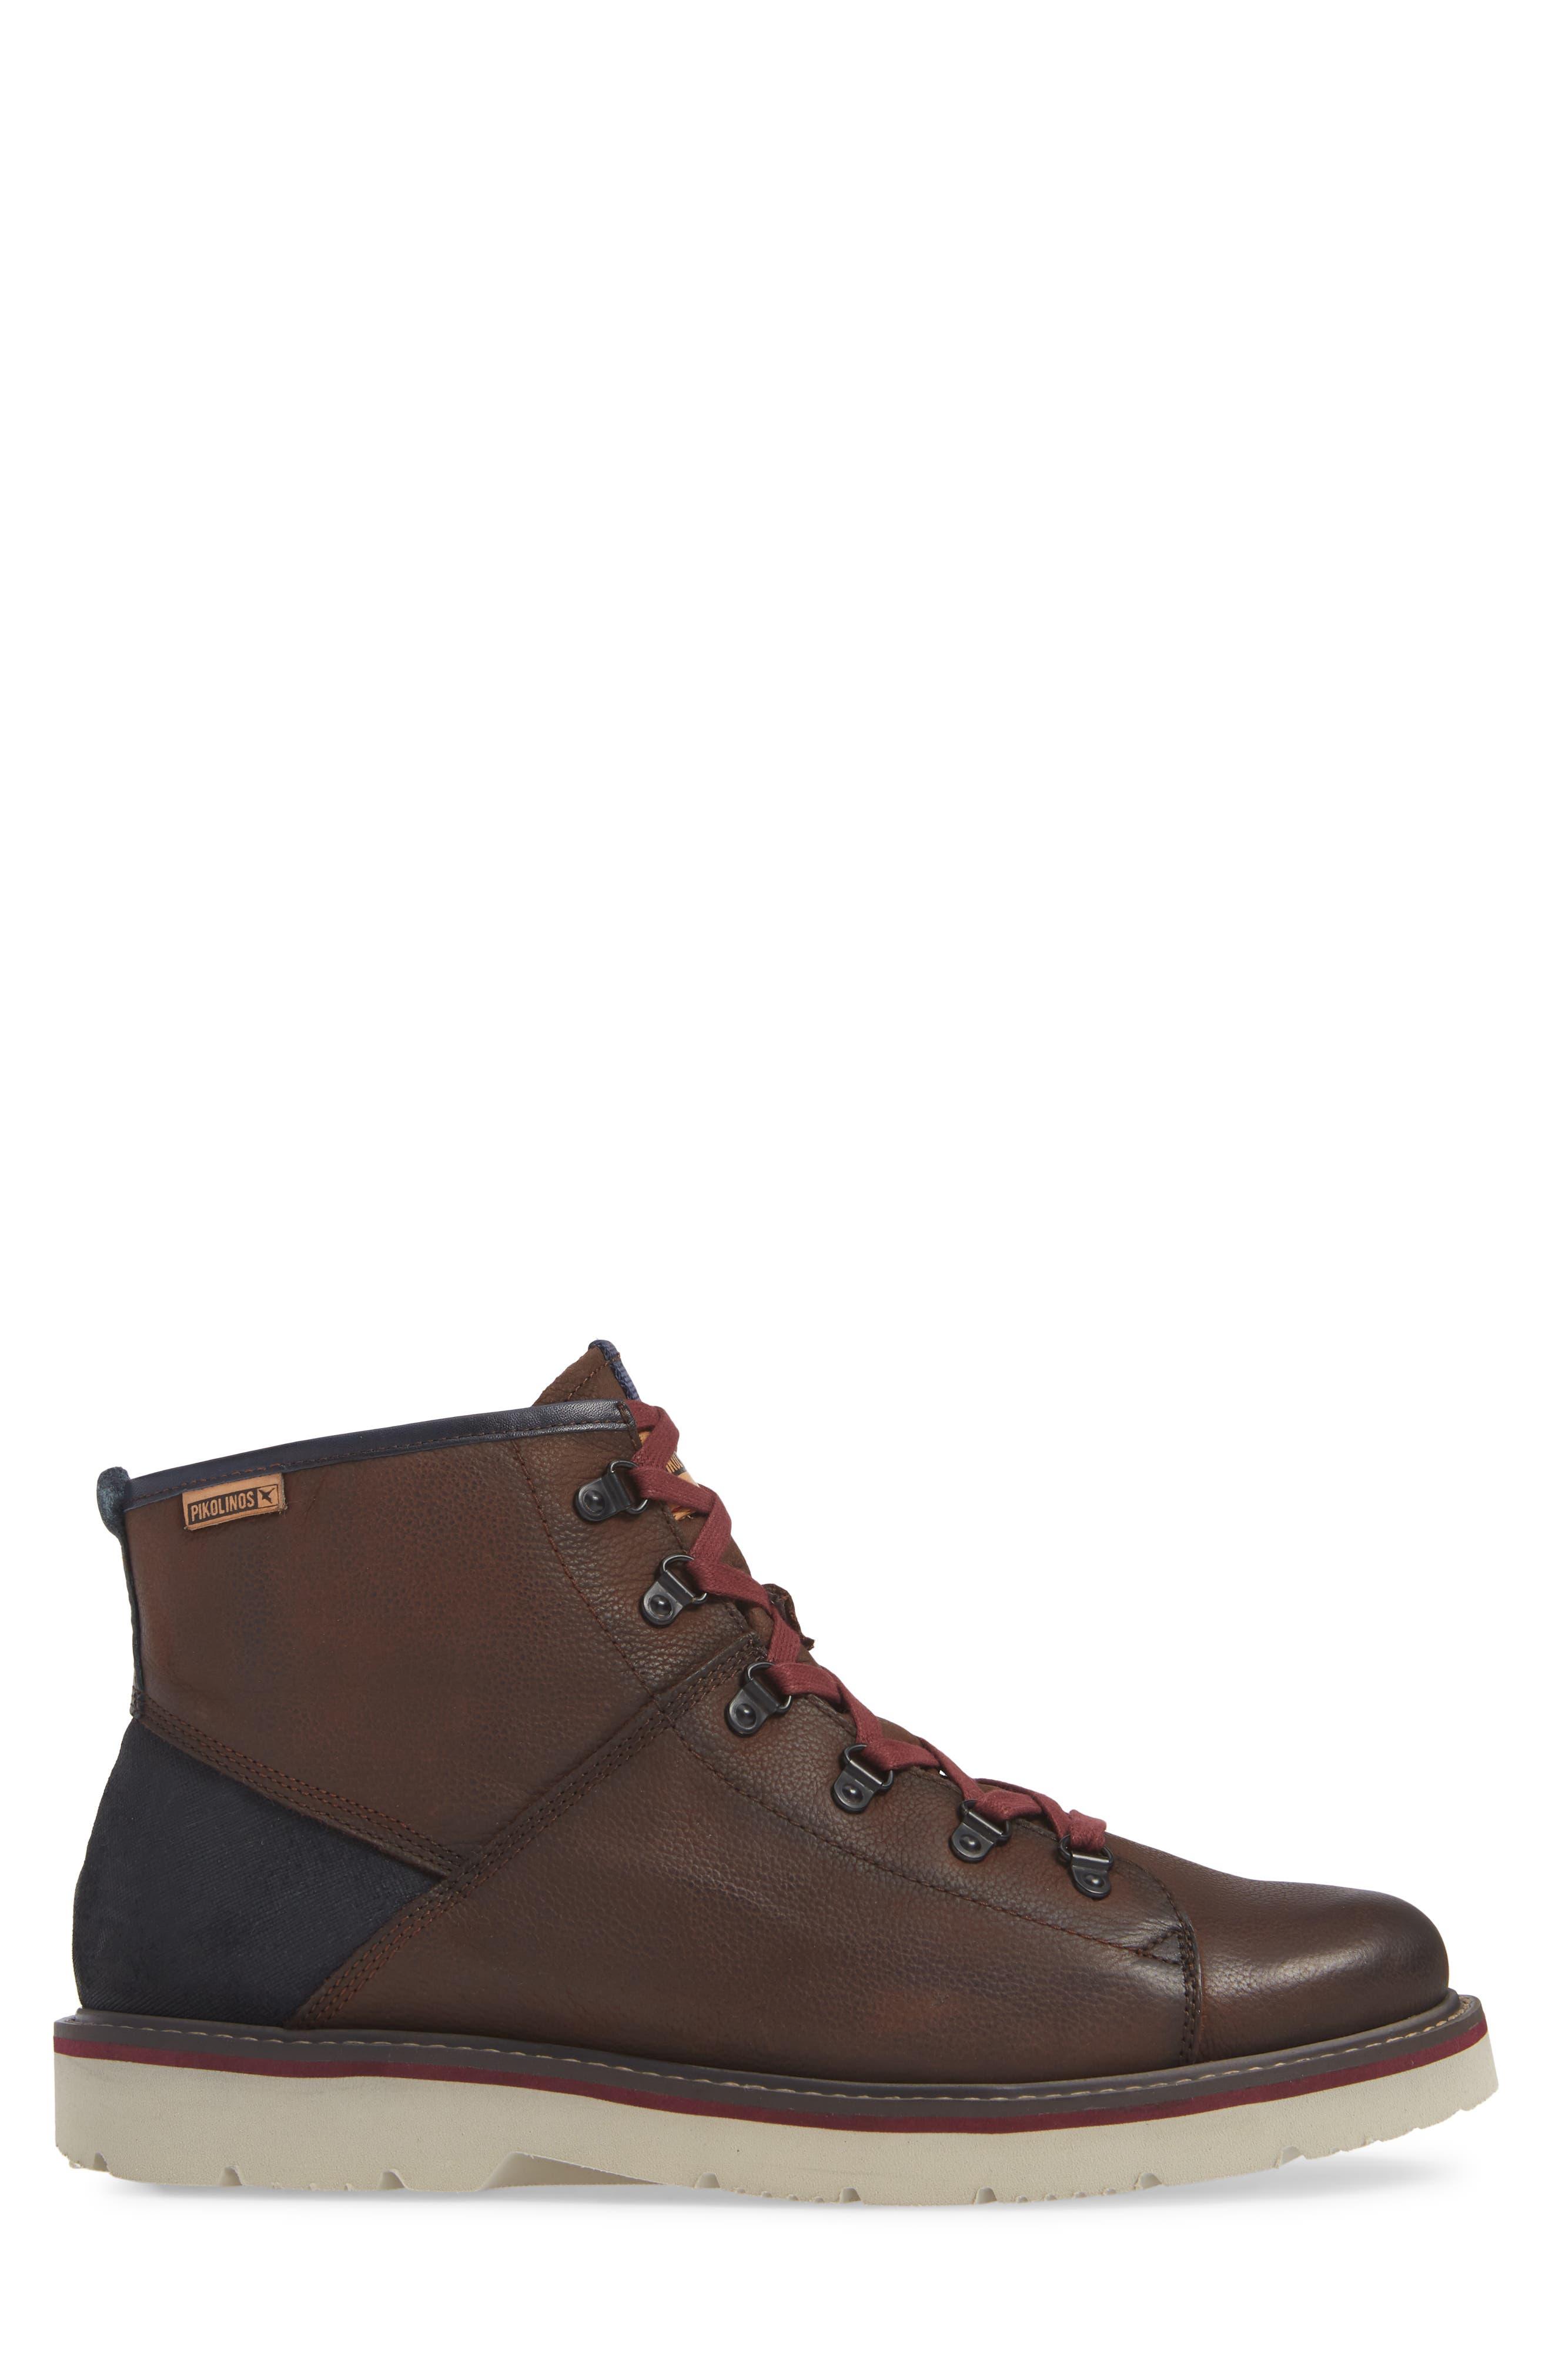 LLeida Plain Toe Boot,                             Alternate thumbnail 3, color,                             617